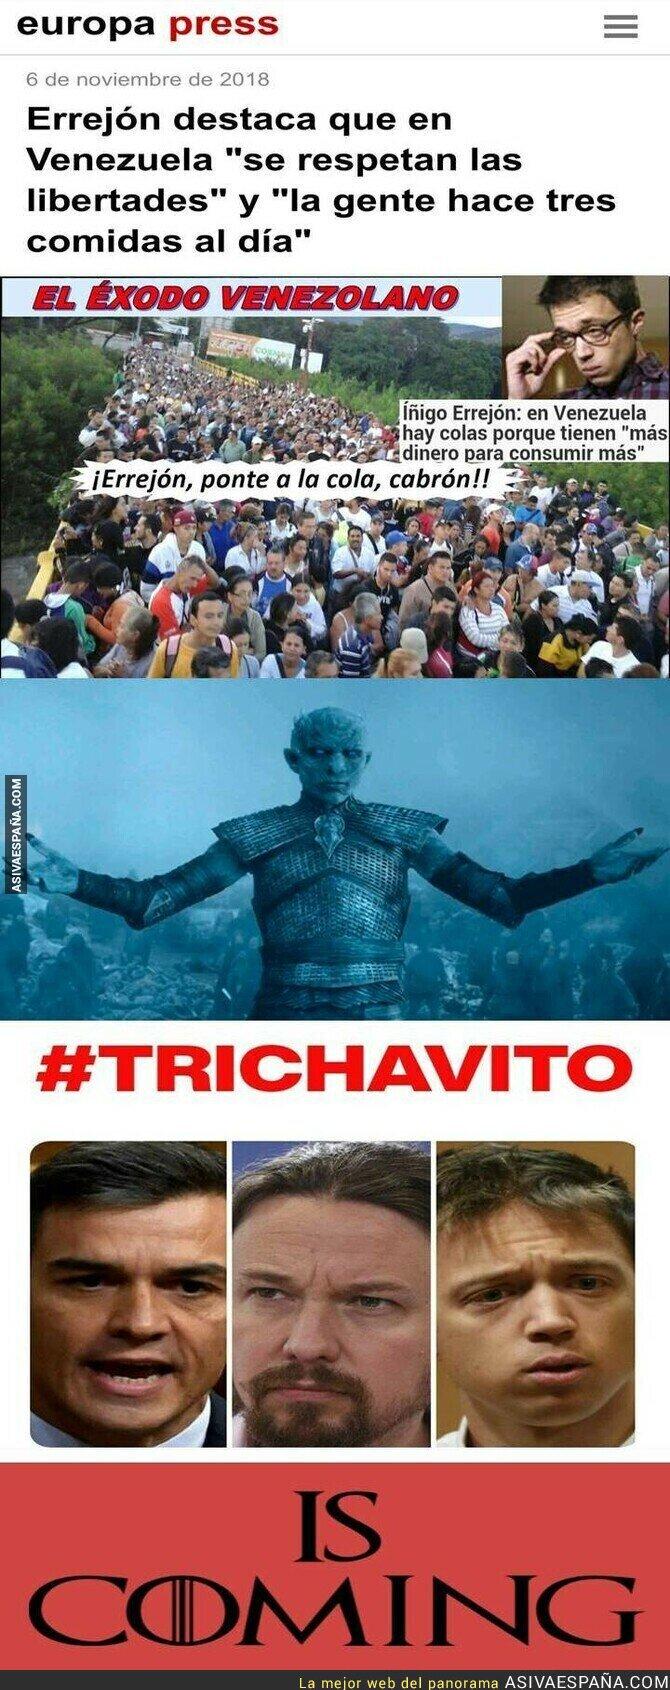 122526 - TRICHAVITO IS COMING